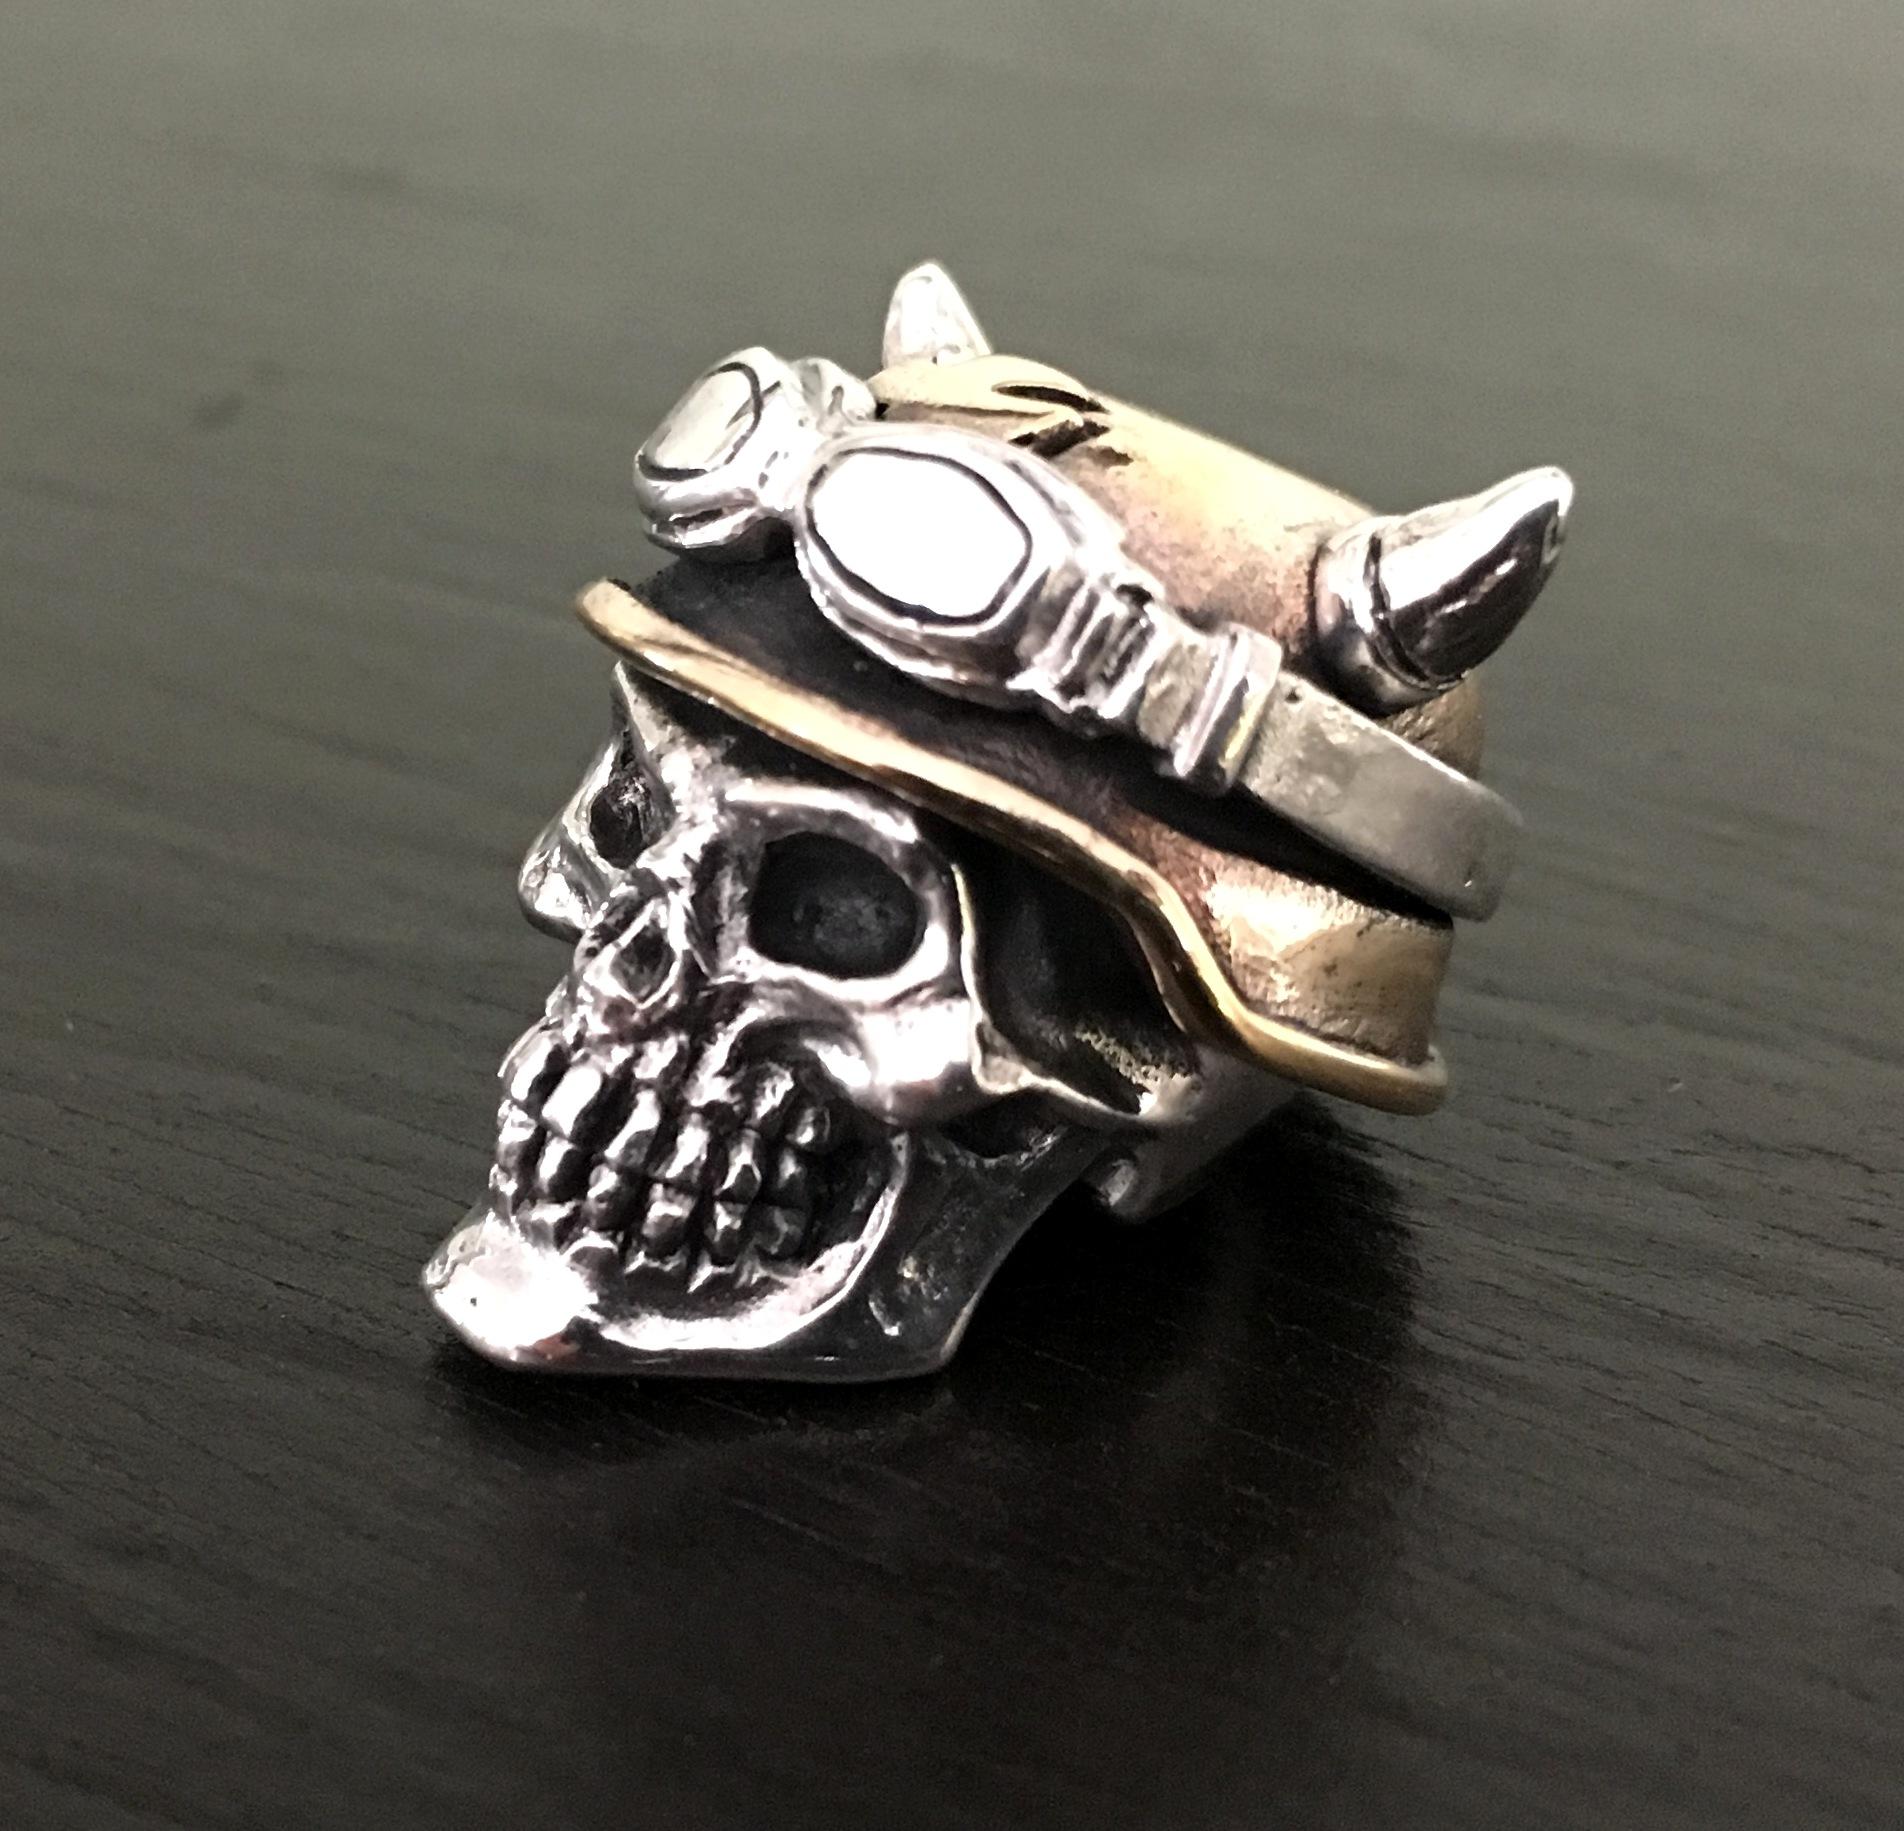 Biker Skull Bead – GD Skulls USA – silver and bronze skull jewelry ...